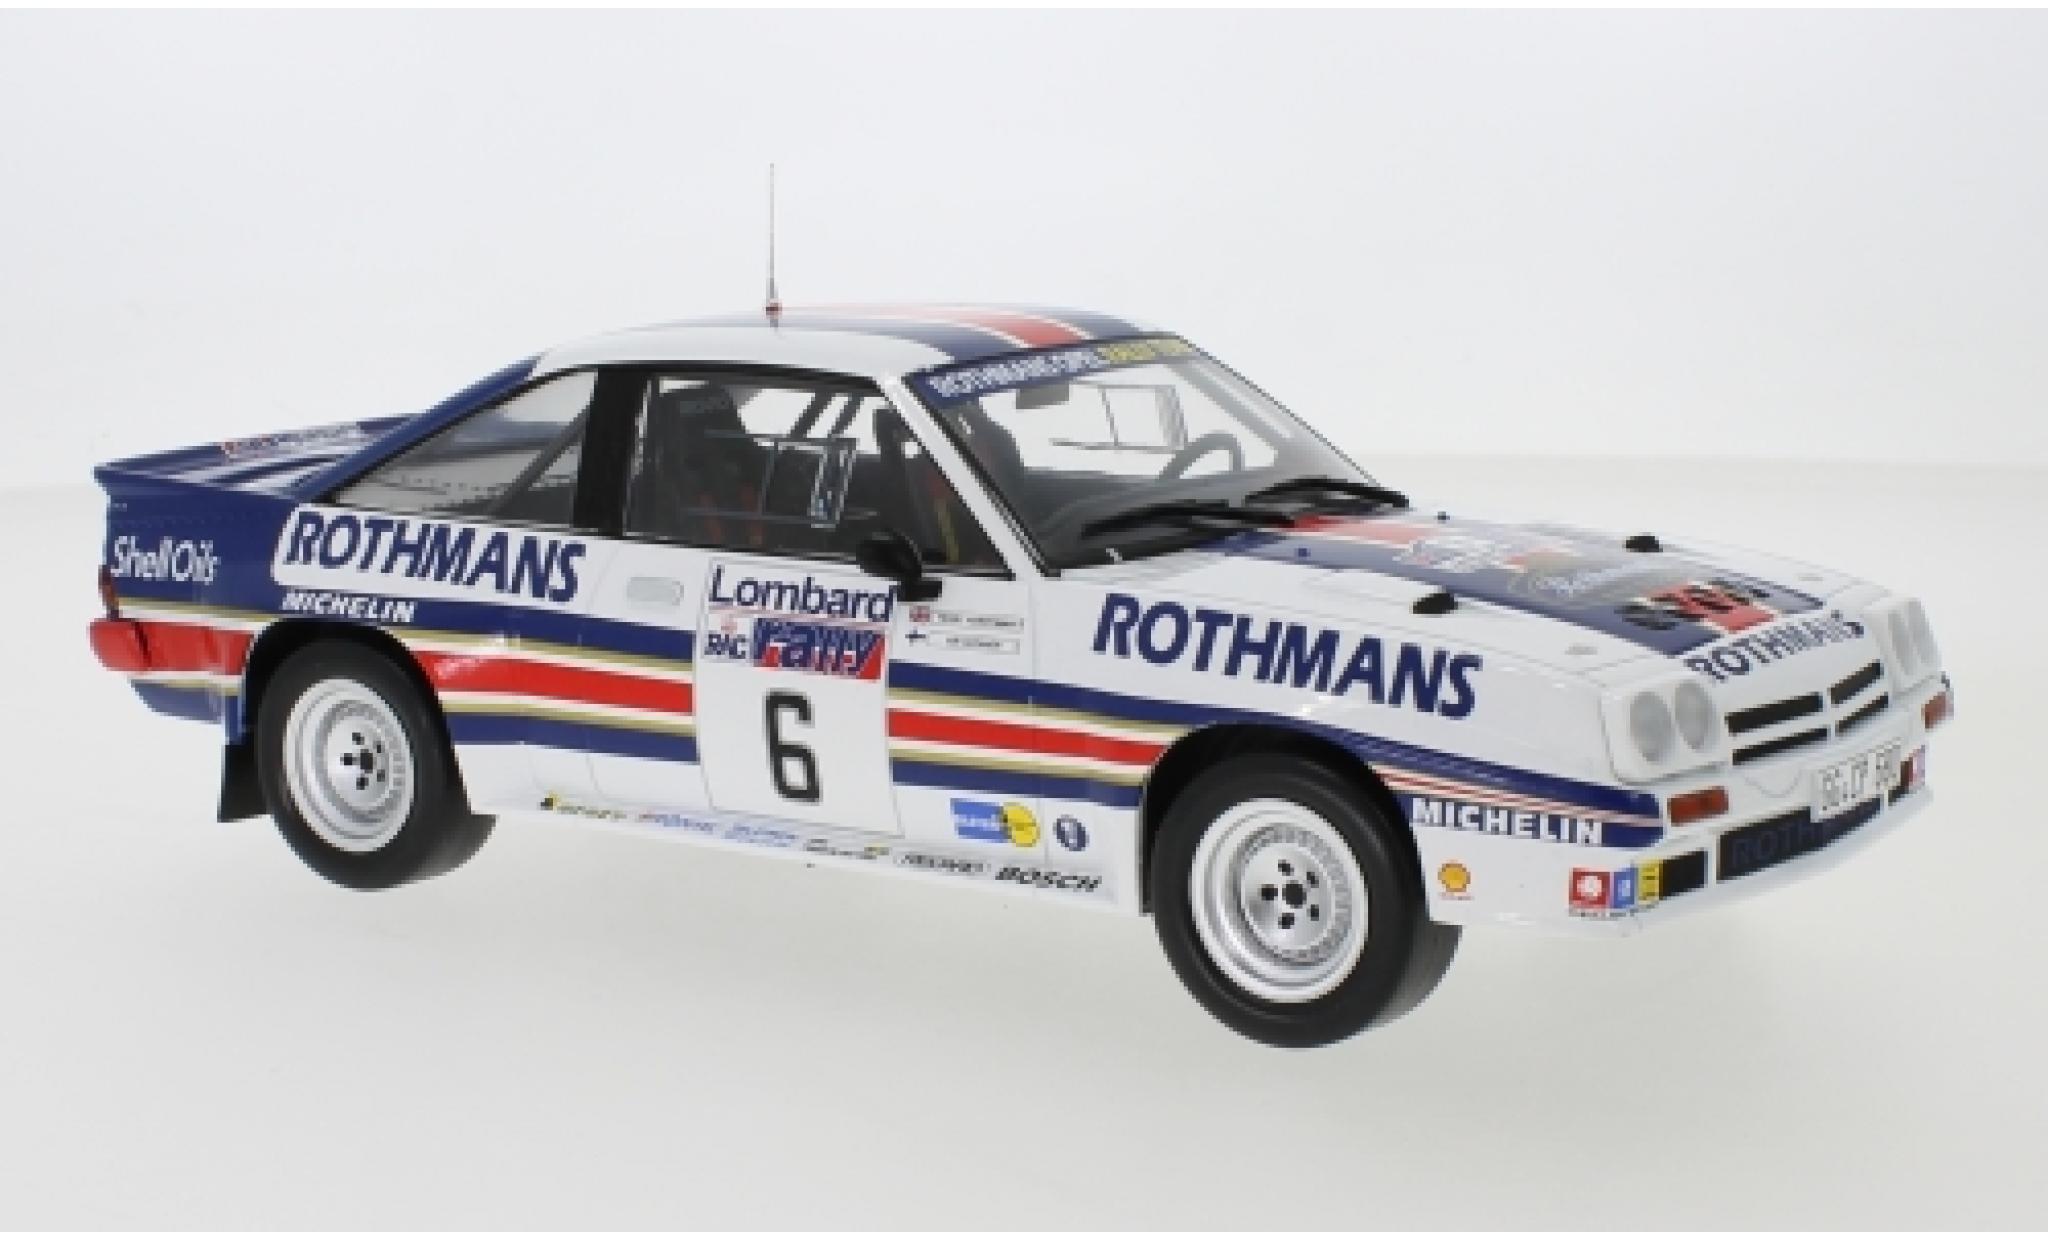 Opel Manta 1/18 IXO 400 No.6 Rothmans Rally Team Rothmans Rallye WM RAC Rallye 1983 A.Vatanen/T.Harryman